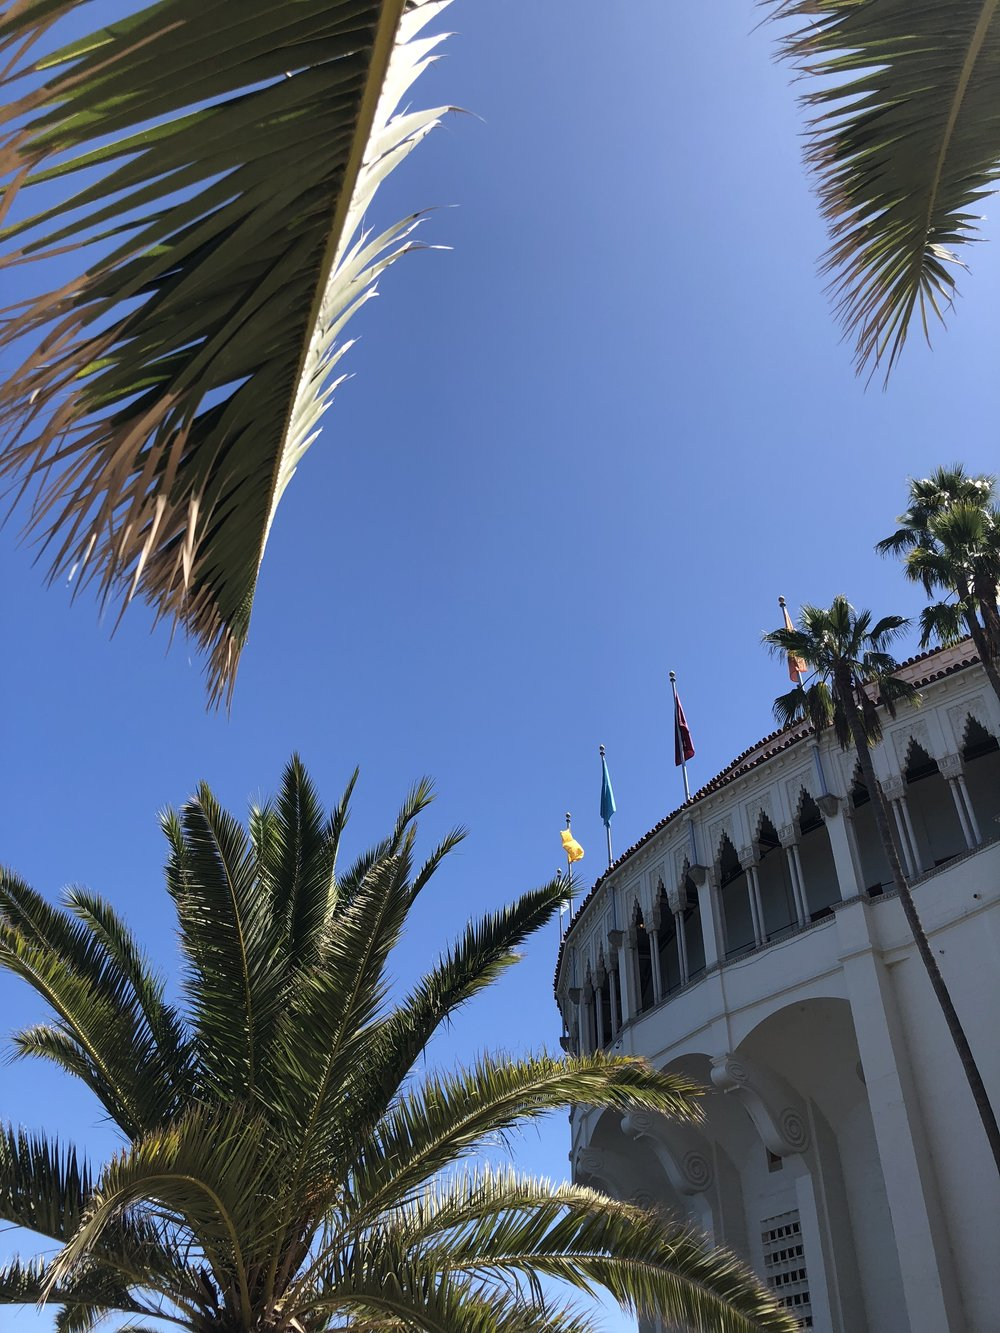 The Casino in Avalon, Catalina Island